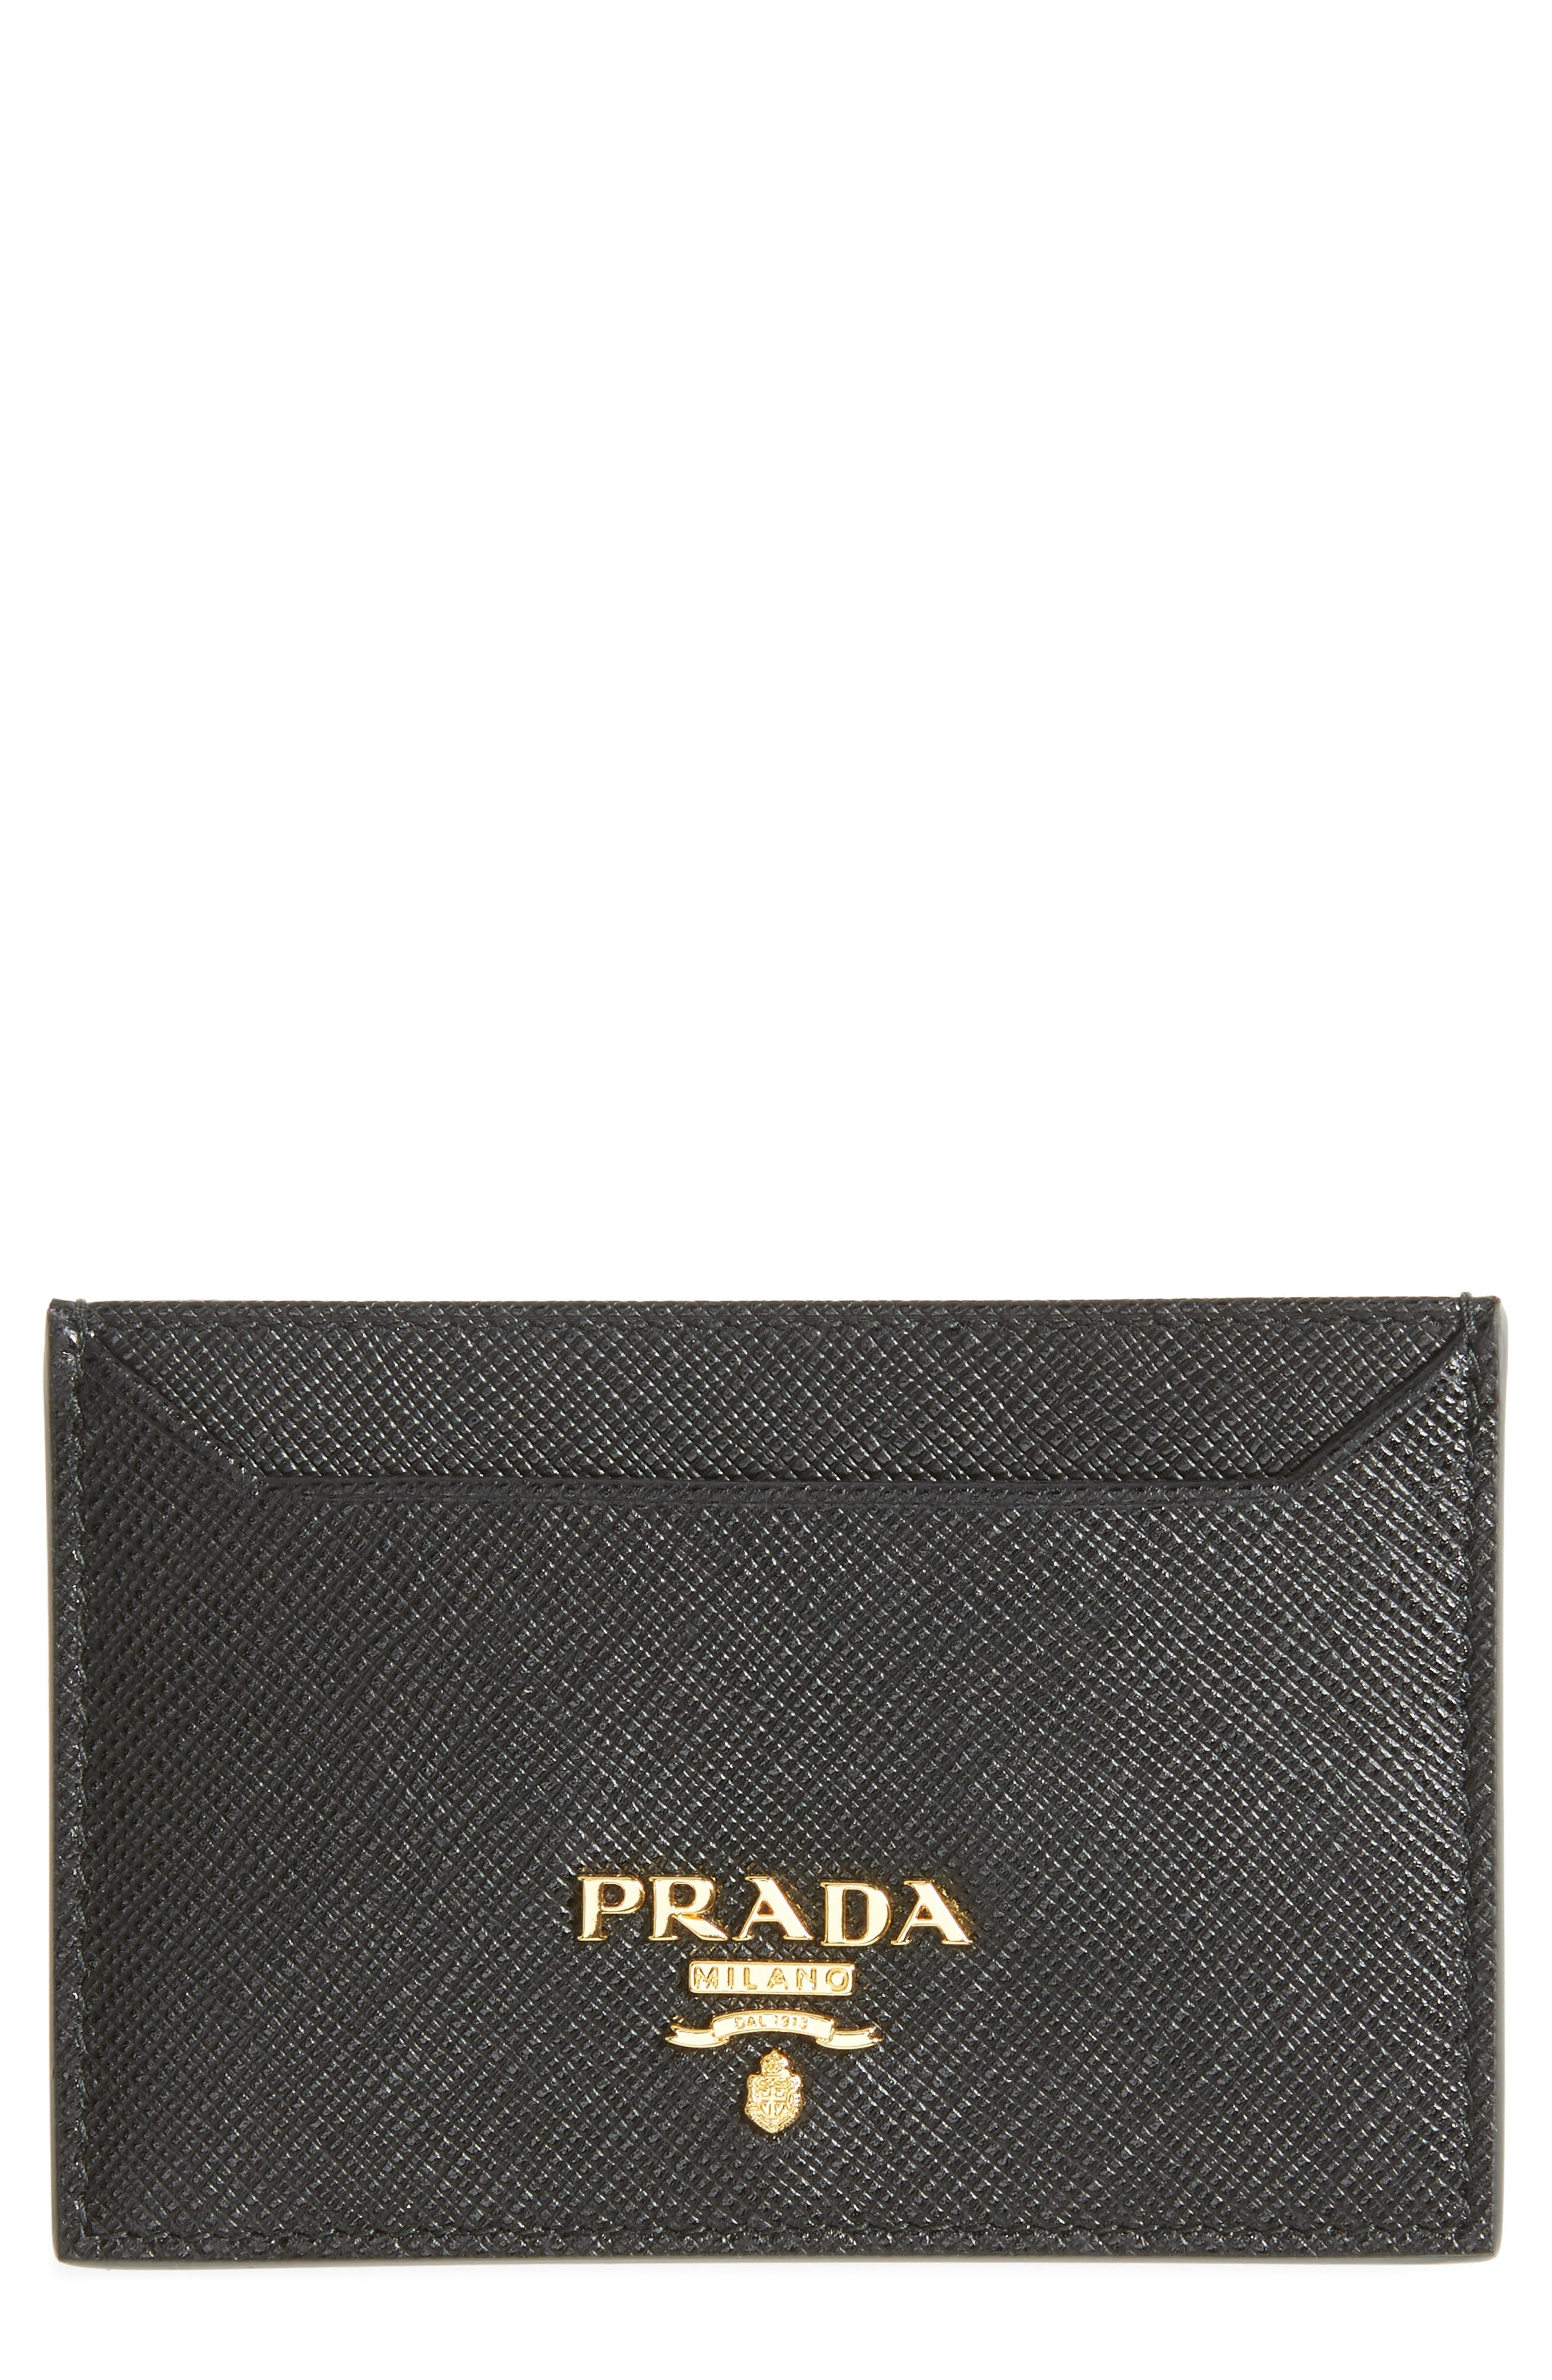 Saffiano Leather Card Case,                             Main thumbnail 1, color,                             NERO